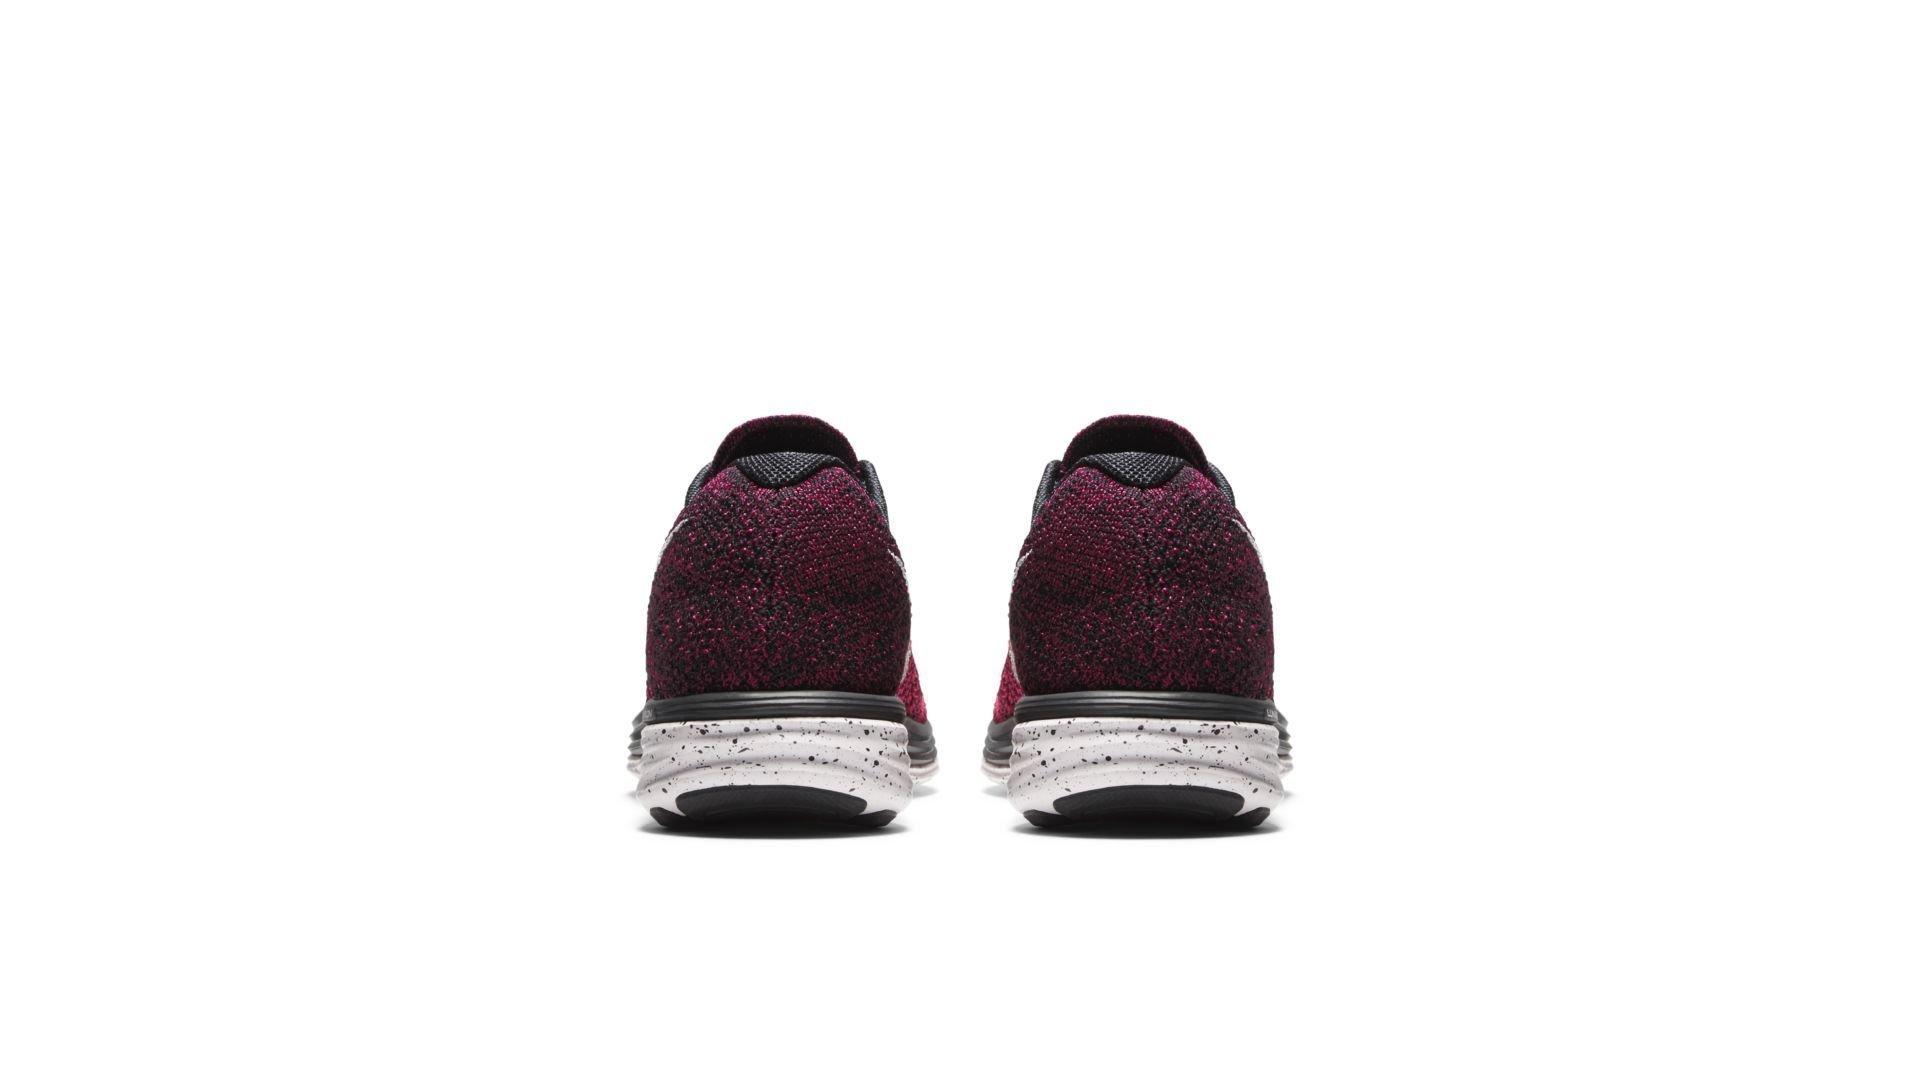 Nike Flyknit Lunar3 Black Pink Orange (W) (698182-002)